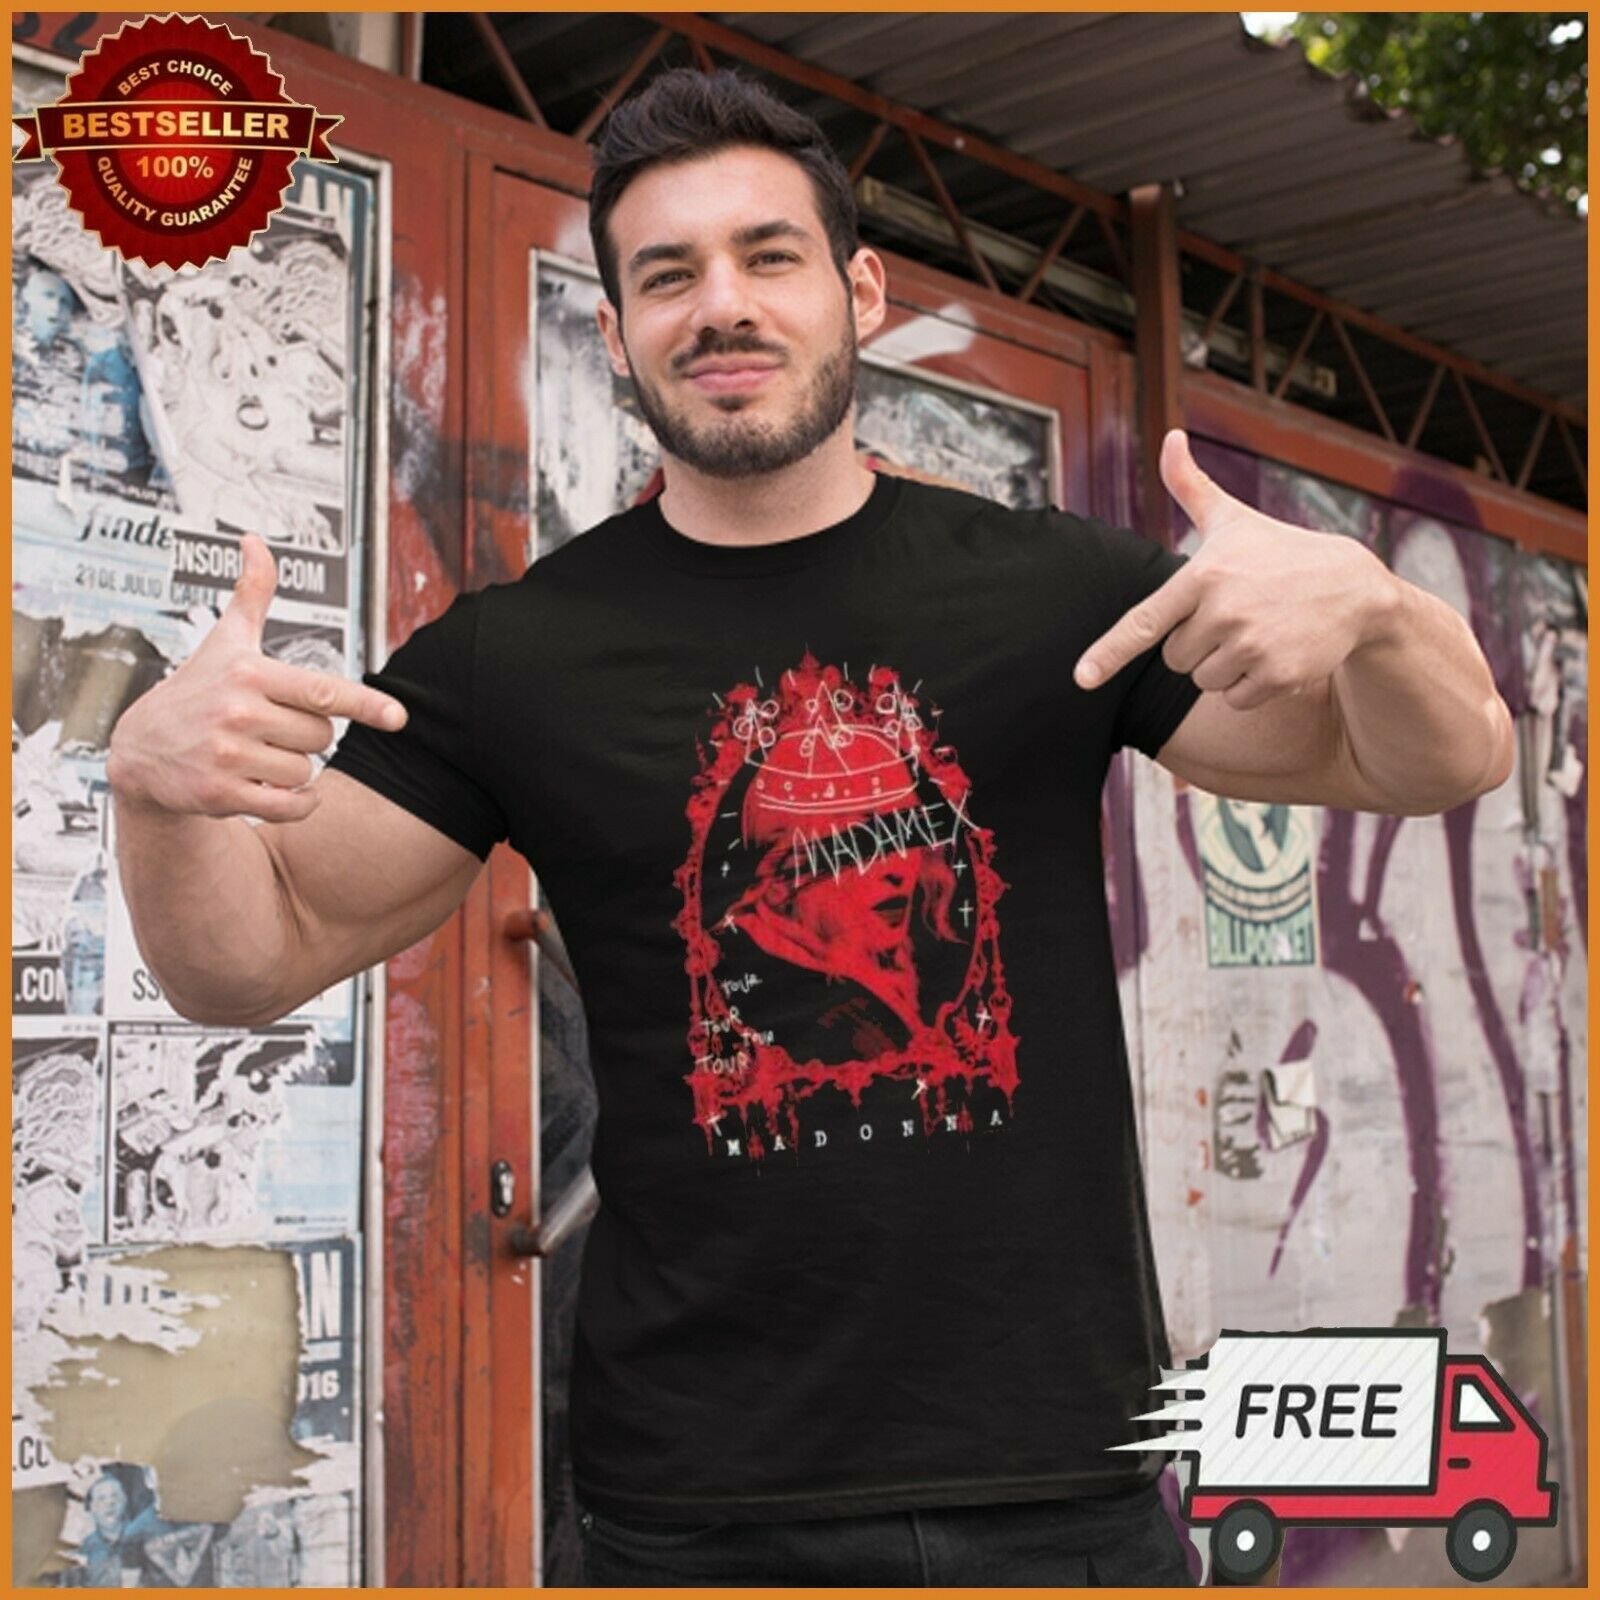 Madame X Tour Madonna Shirt Madonna T Shirt Singer Black Unisex S 6Xl Freeship